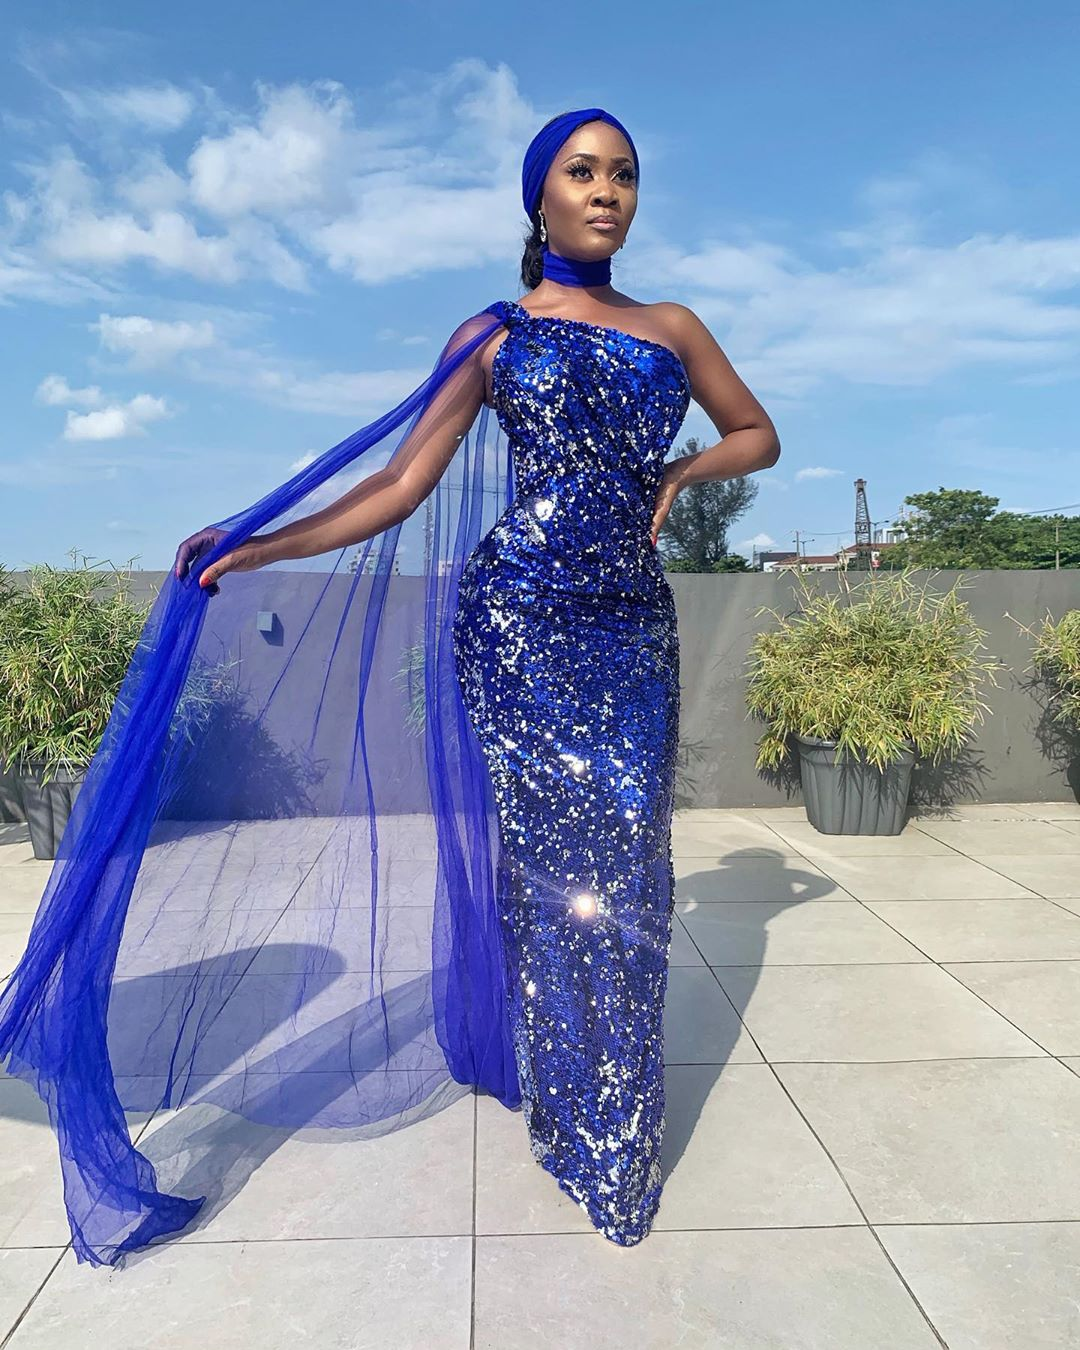 fashionable-nigerian-women-toni-tones